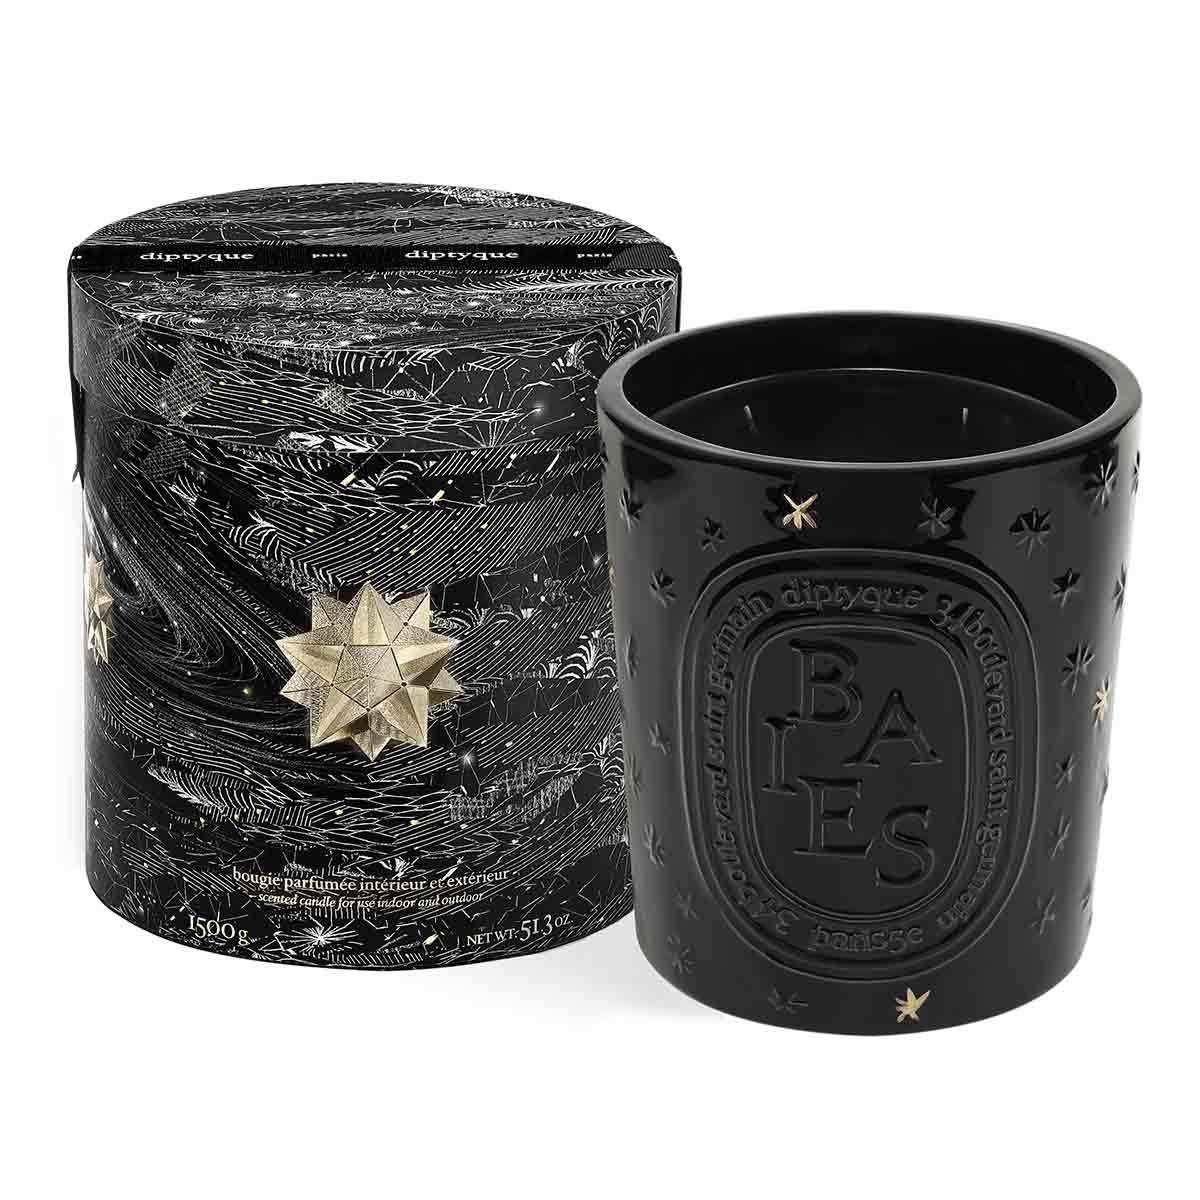 Giant Baies Candle/51.3 oz.